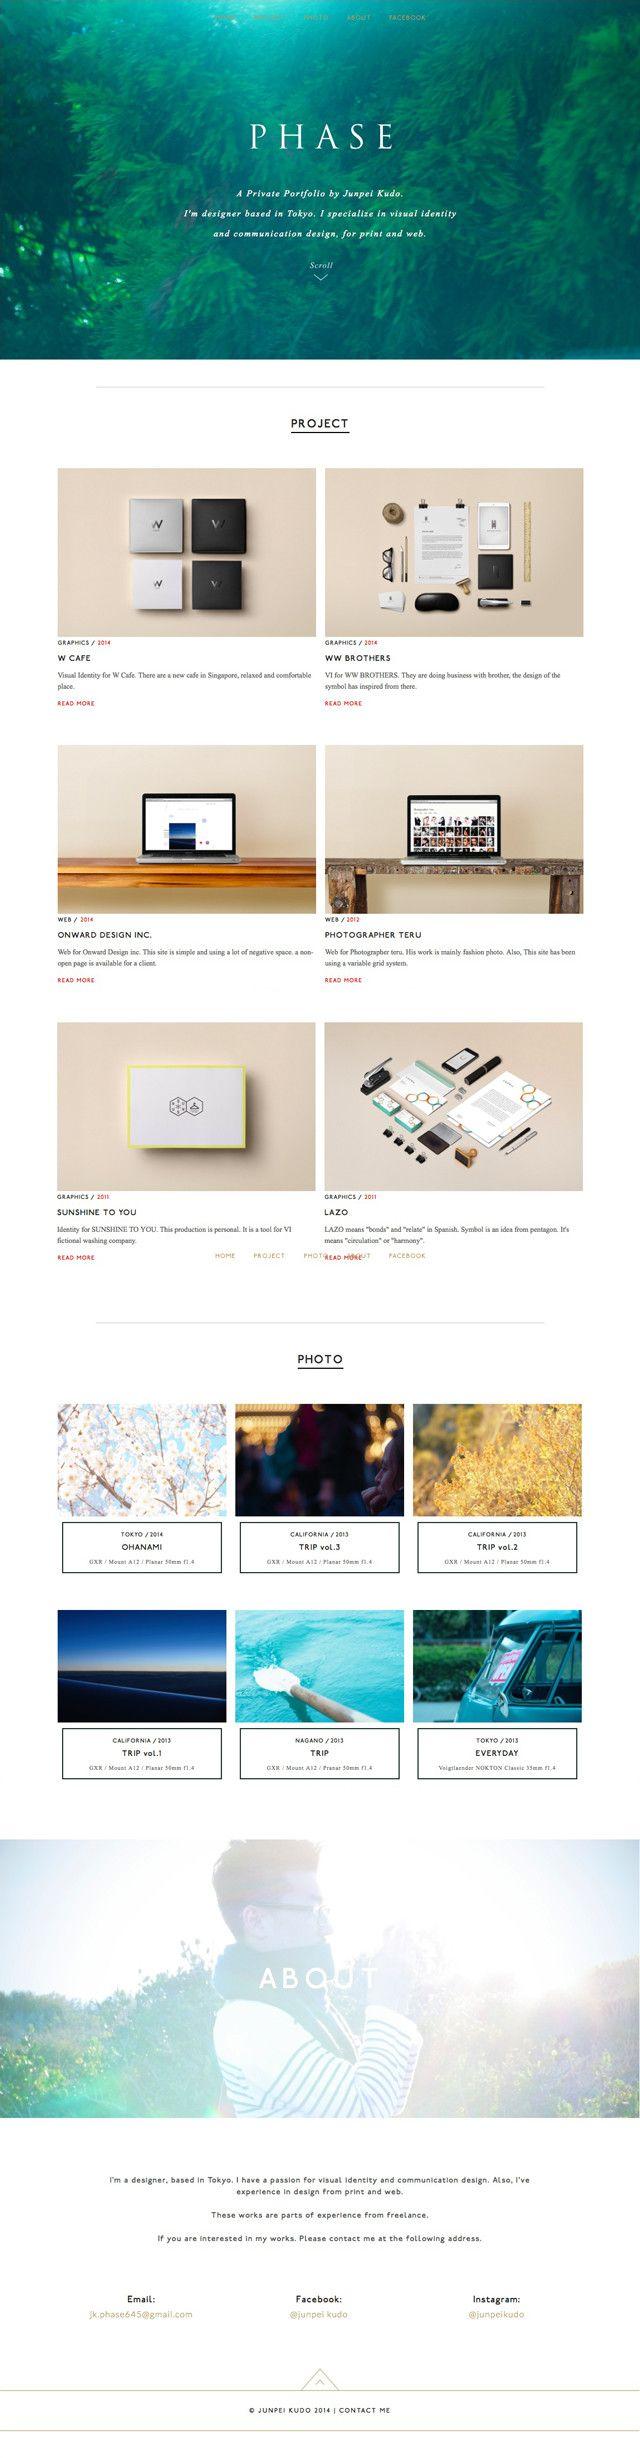 Portfolio site - kudo